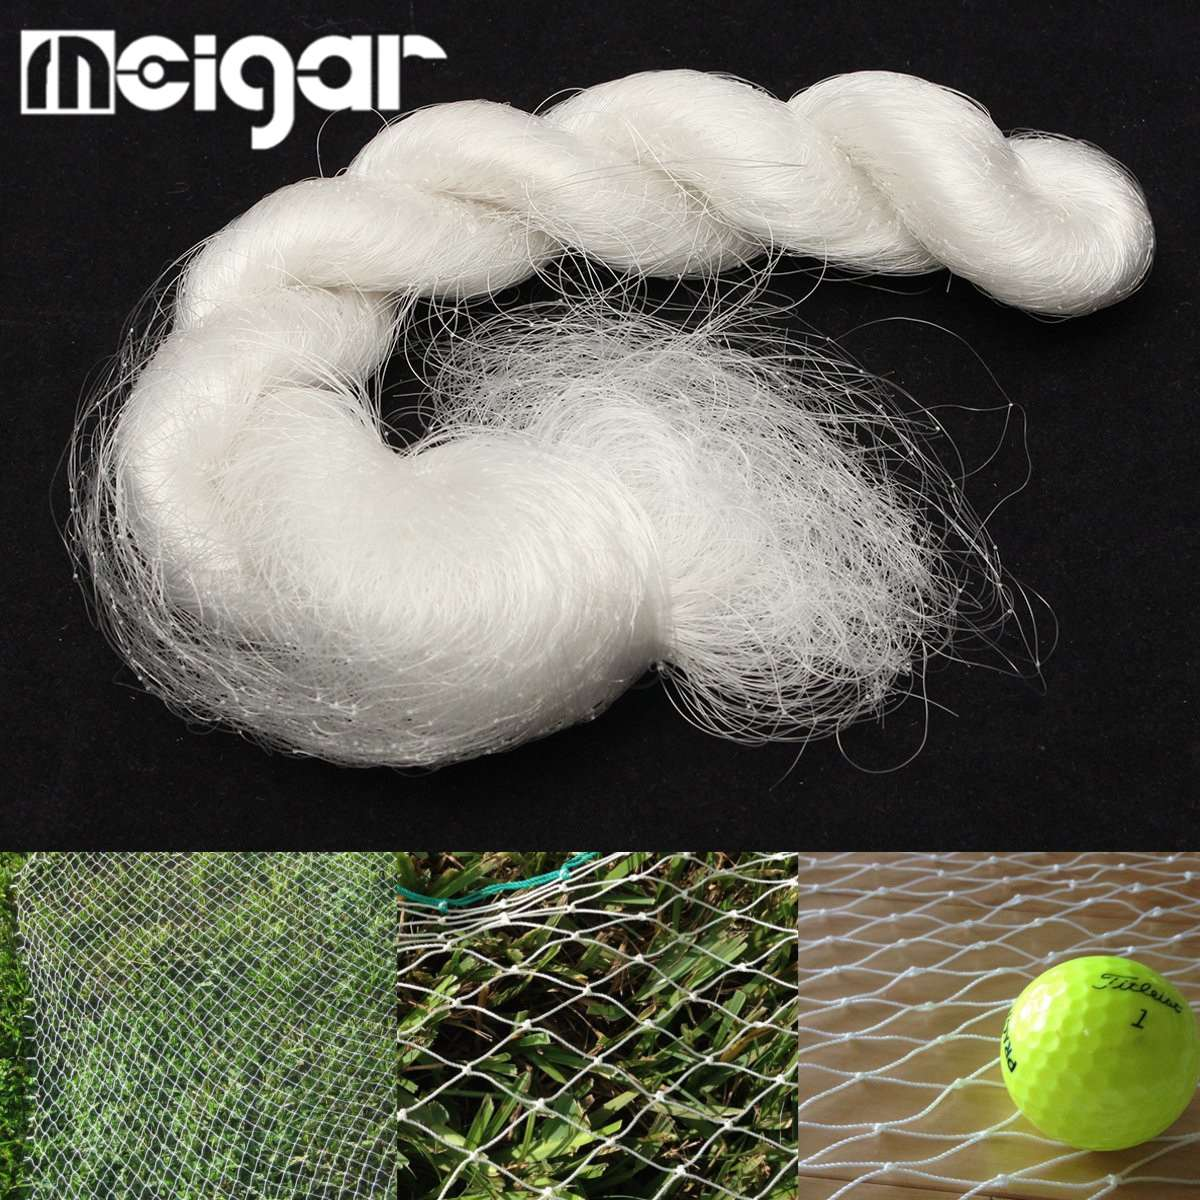 White Nylon Mesh Anti Bird Net Golf Barrier Sports Game Bird Netting Poultry Pen Fish Net 25X11 Garden Plantation Pest Control